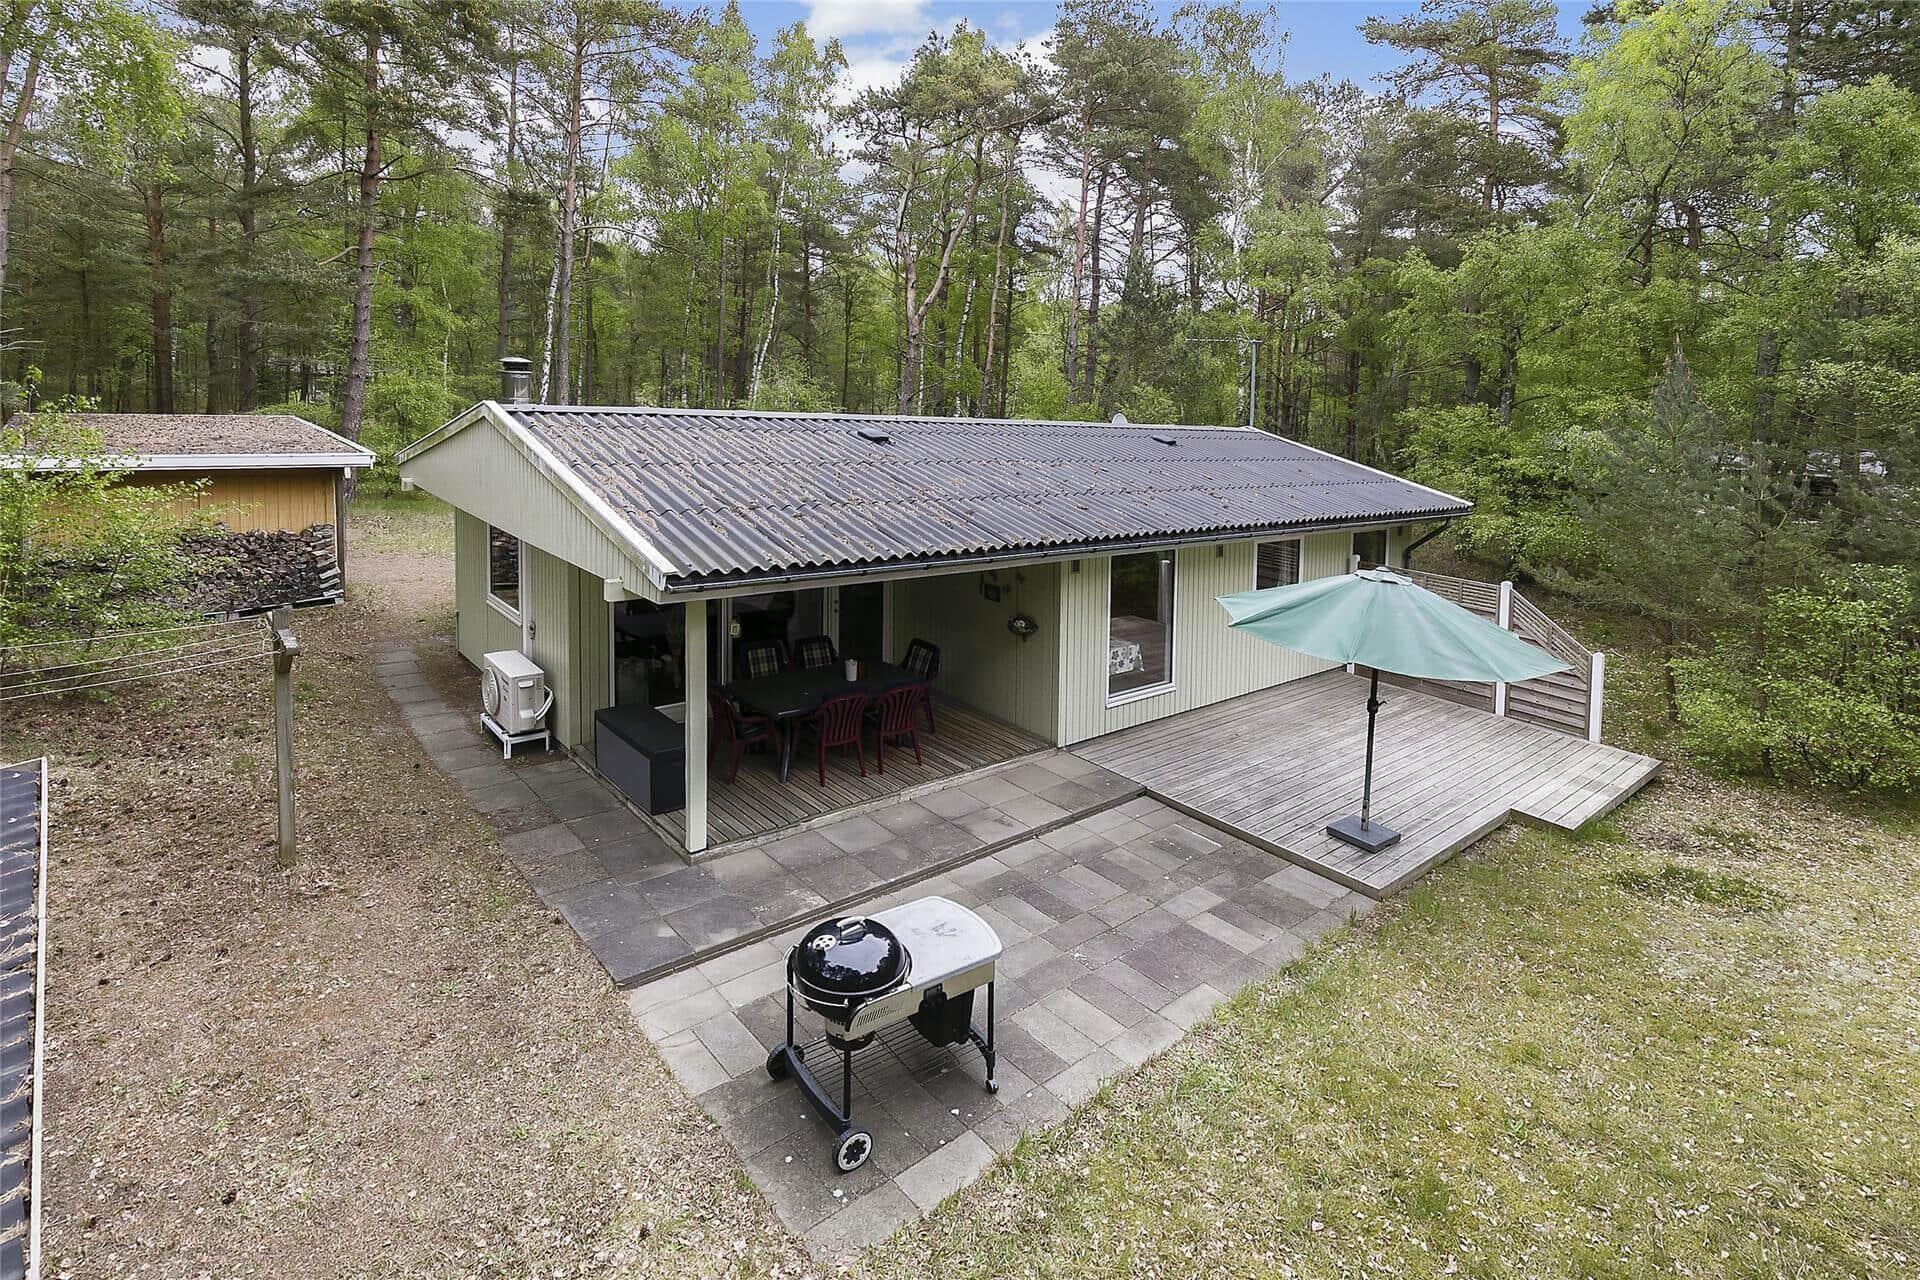 Billede 1-10 Sommerhus 2670, Fasanvej 12, DK - 3730 Nexø